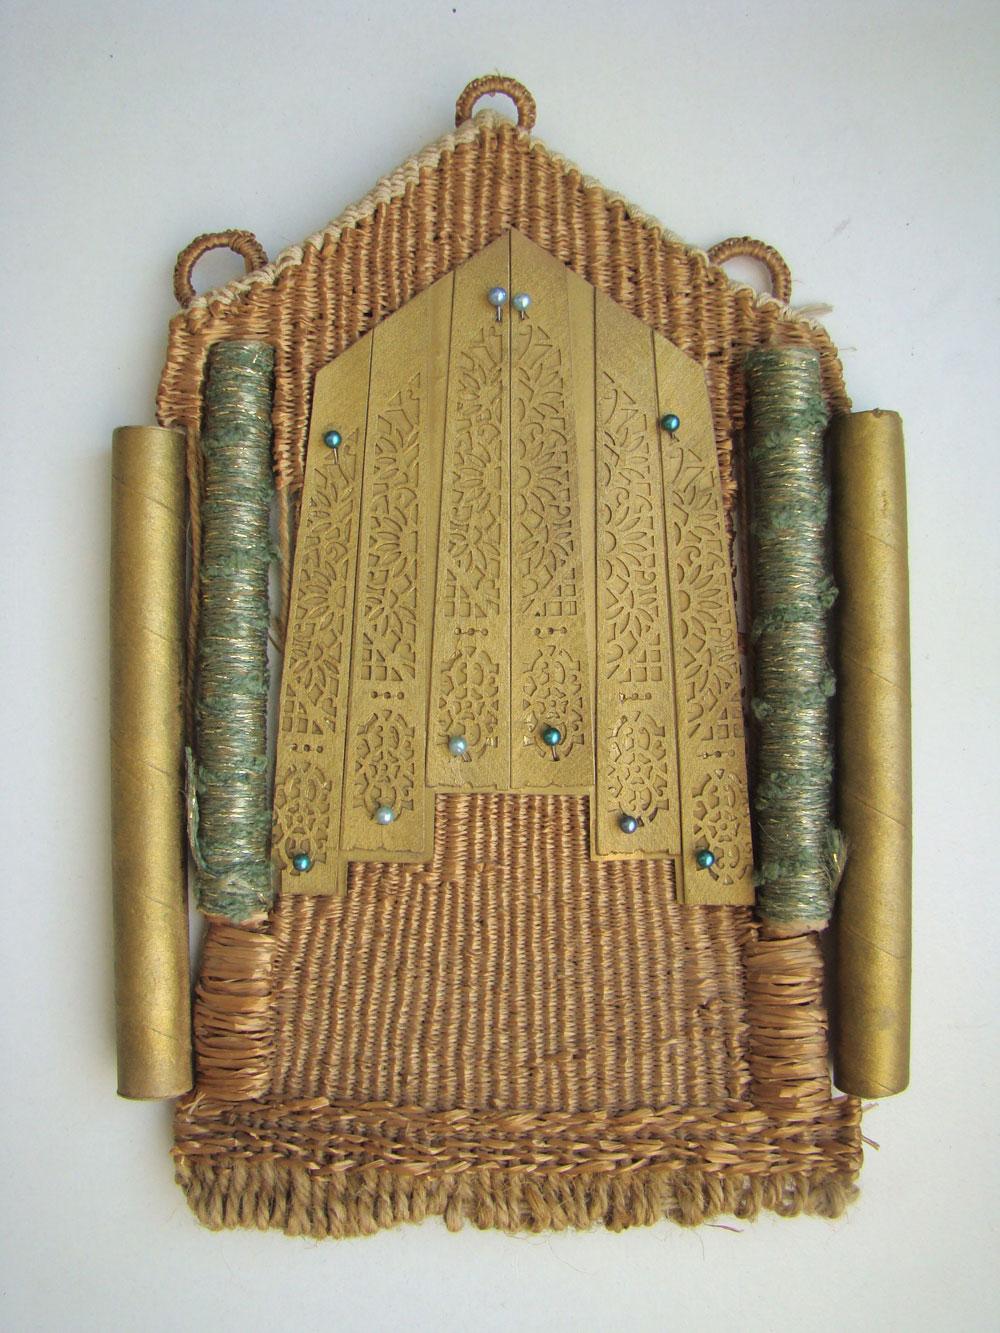 Altar - 21x18 cm